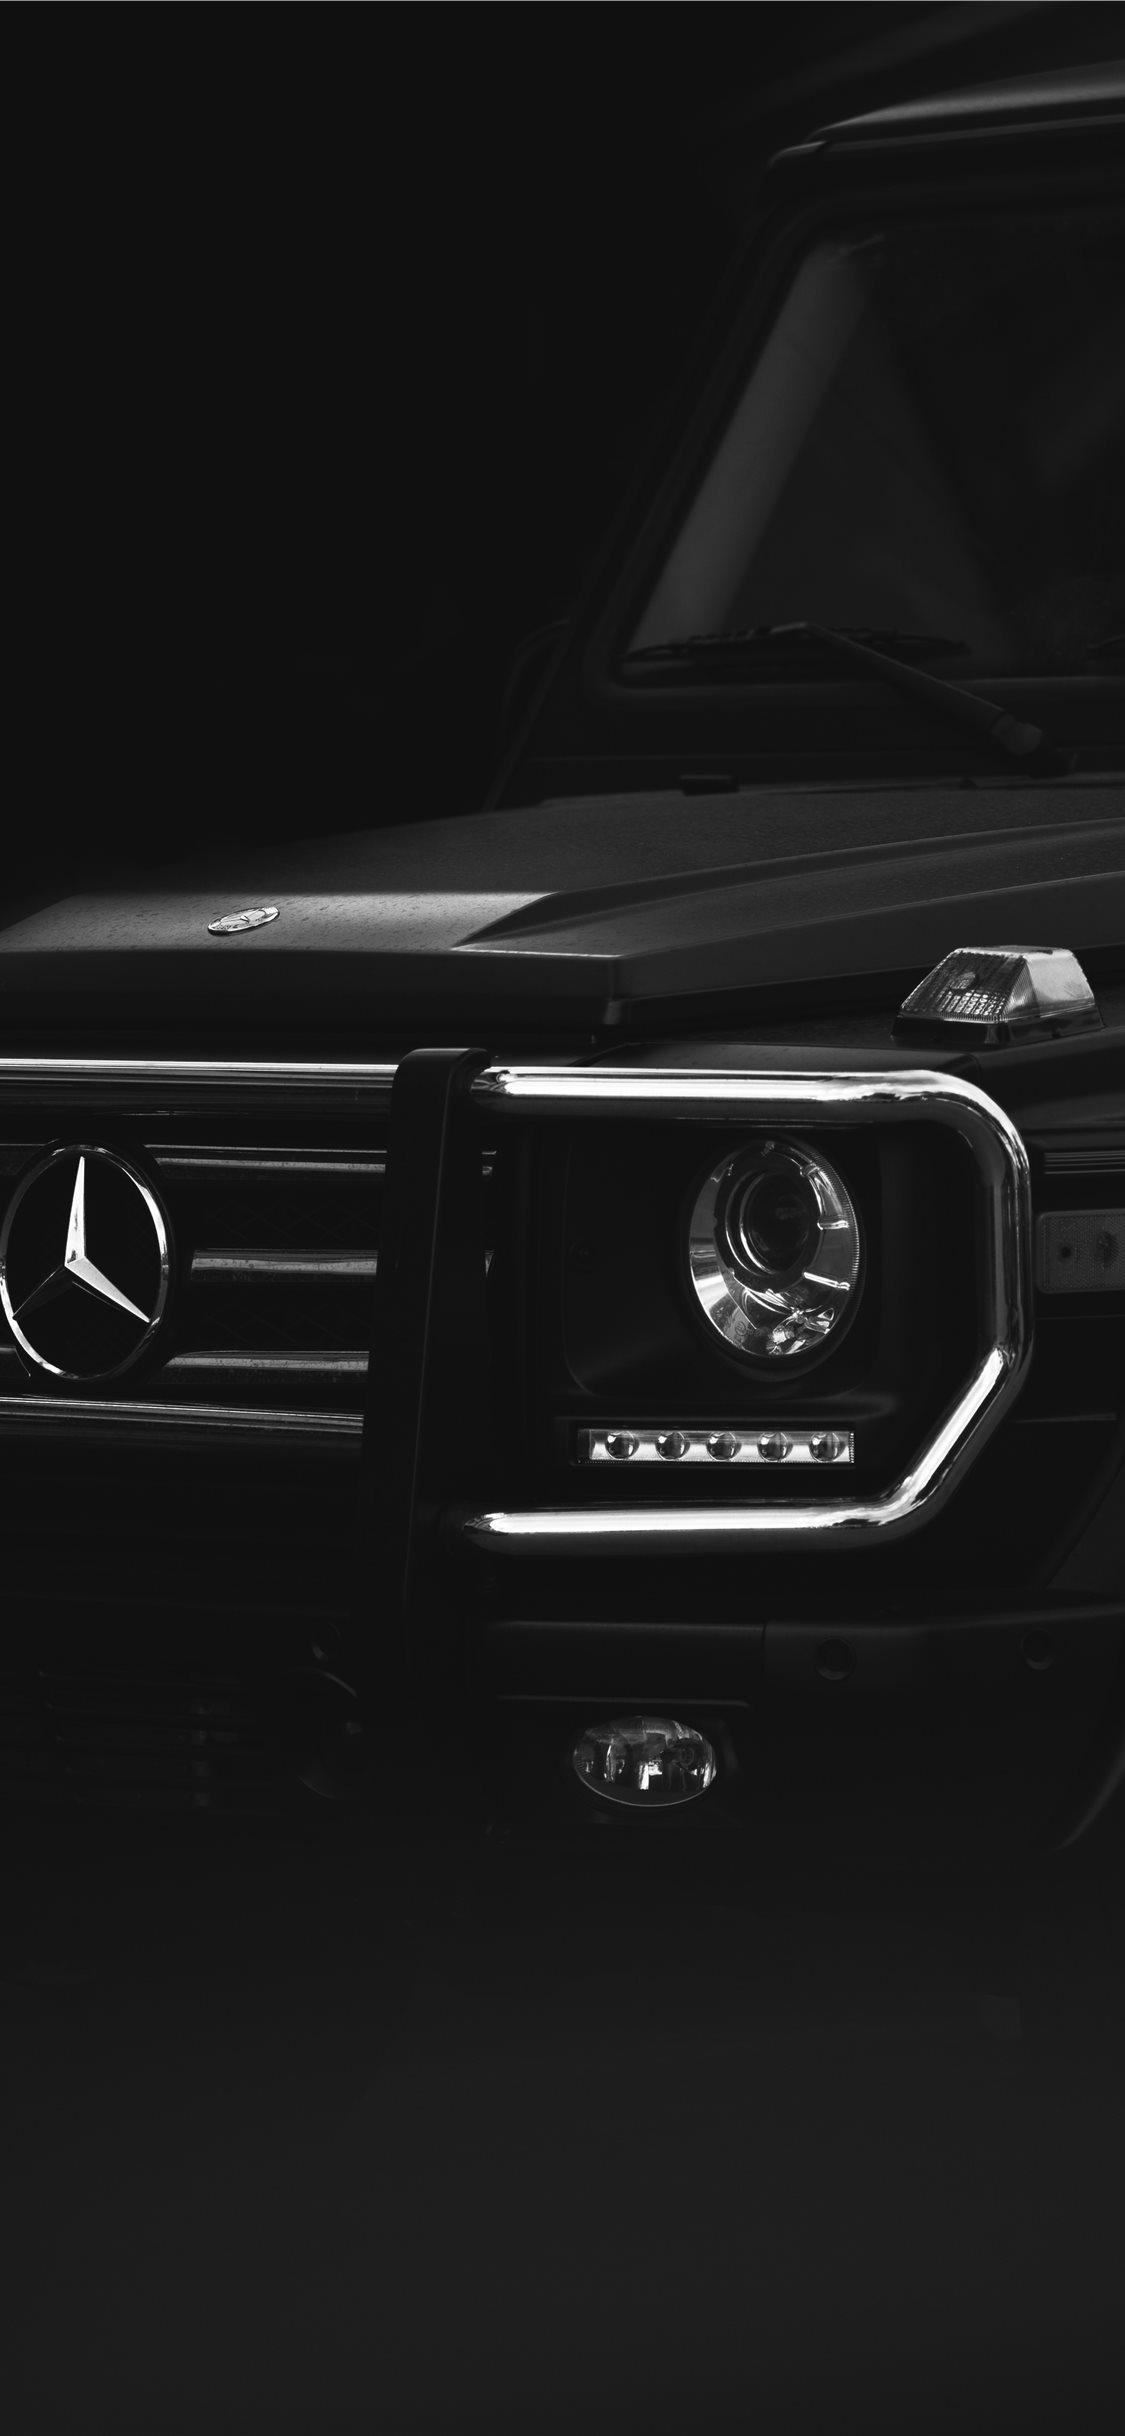 black Mercedes Benz car iPhone X Wallpapers Download 1125x2436